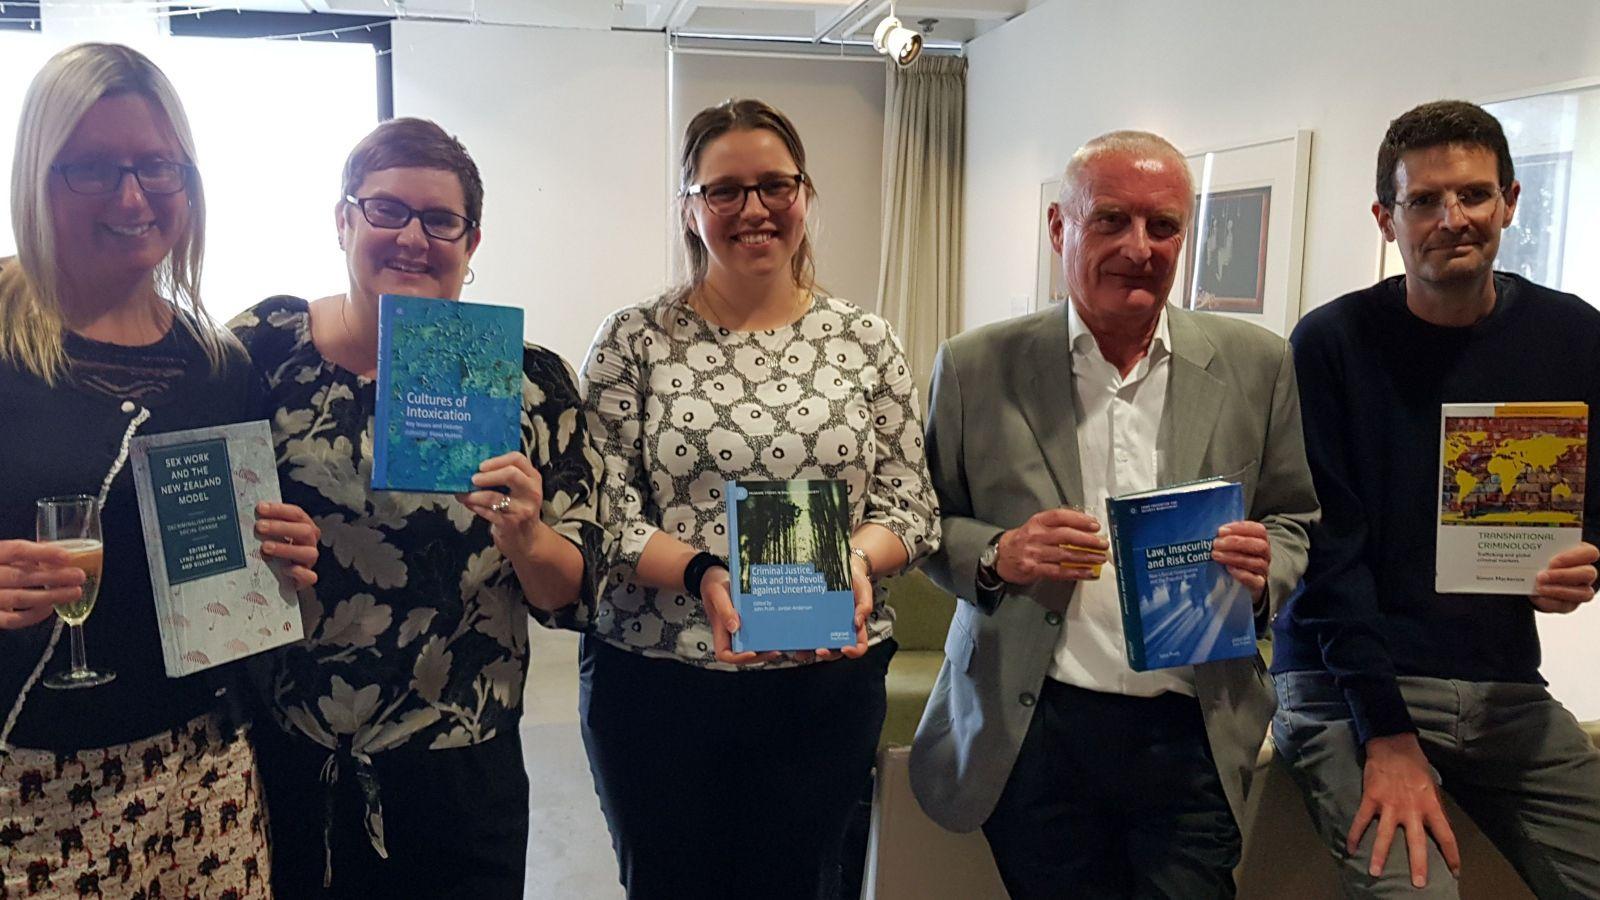 Left to right: Dr Lynzi Armstrong, Associate Professor Fiona Hutton, PhD candidate Jordan Anderson, Professor John Pratt, and Professor Simon Mackenzie.